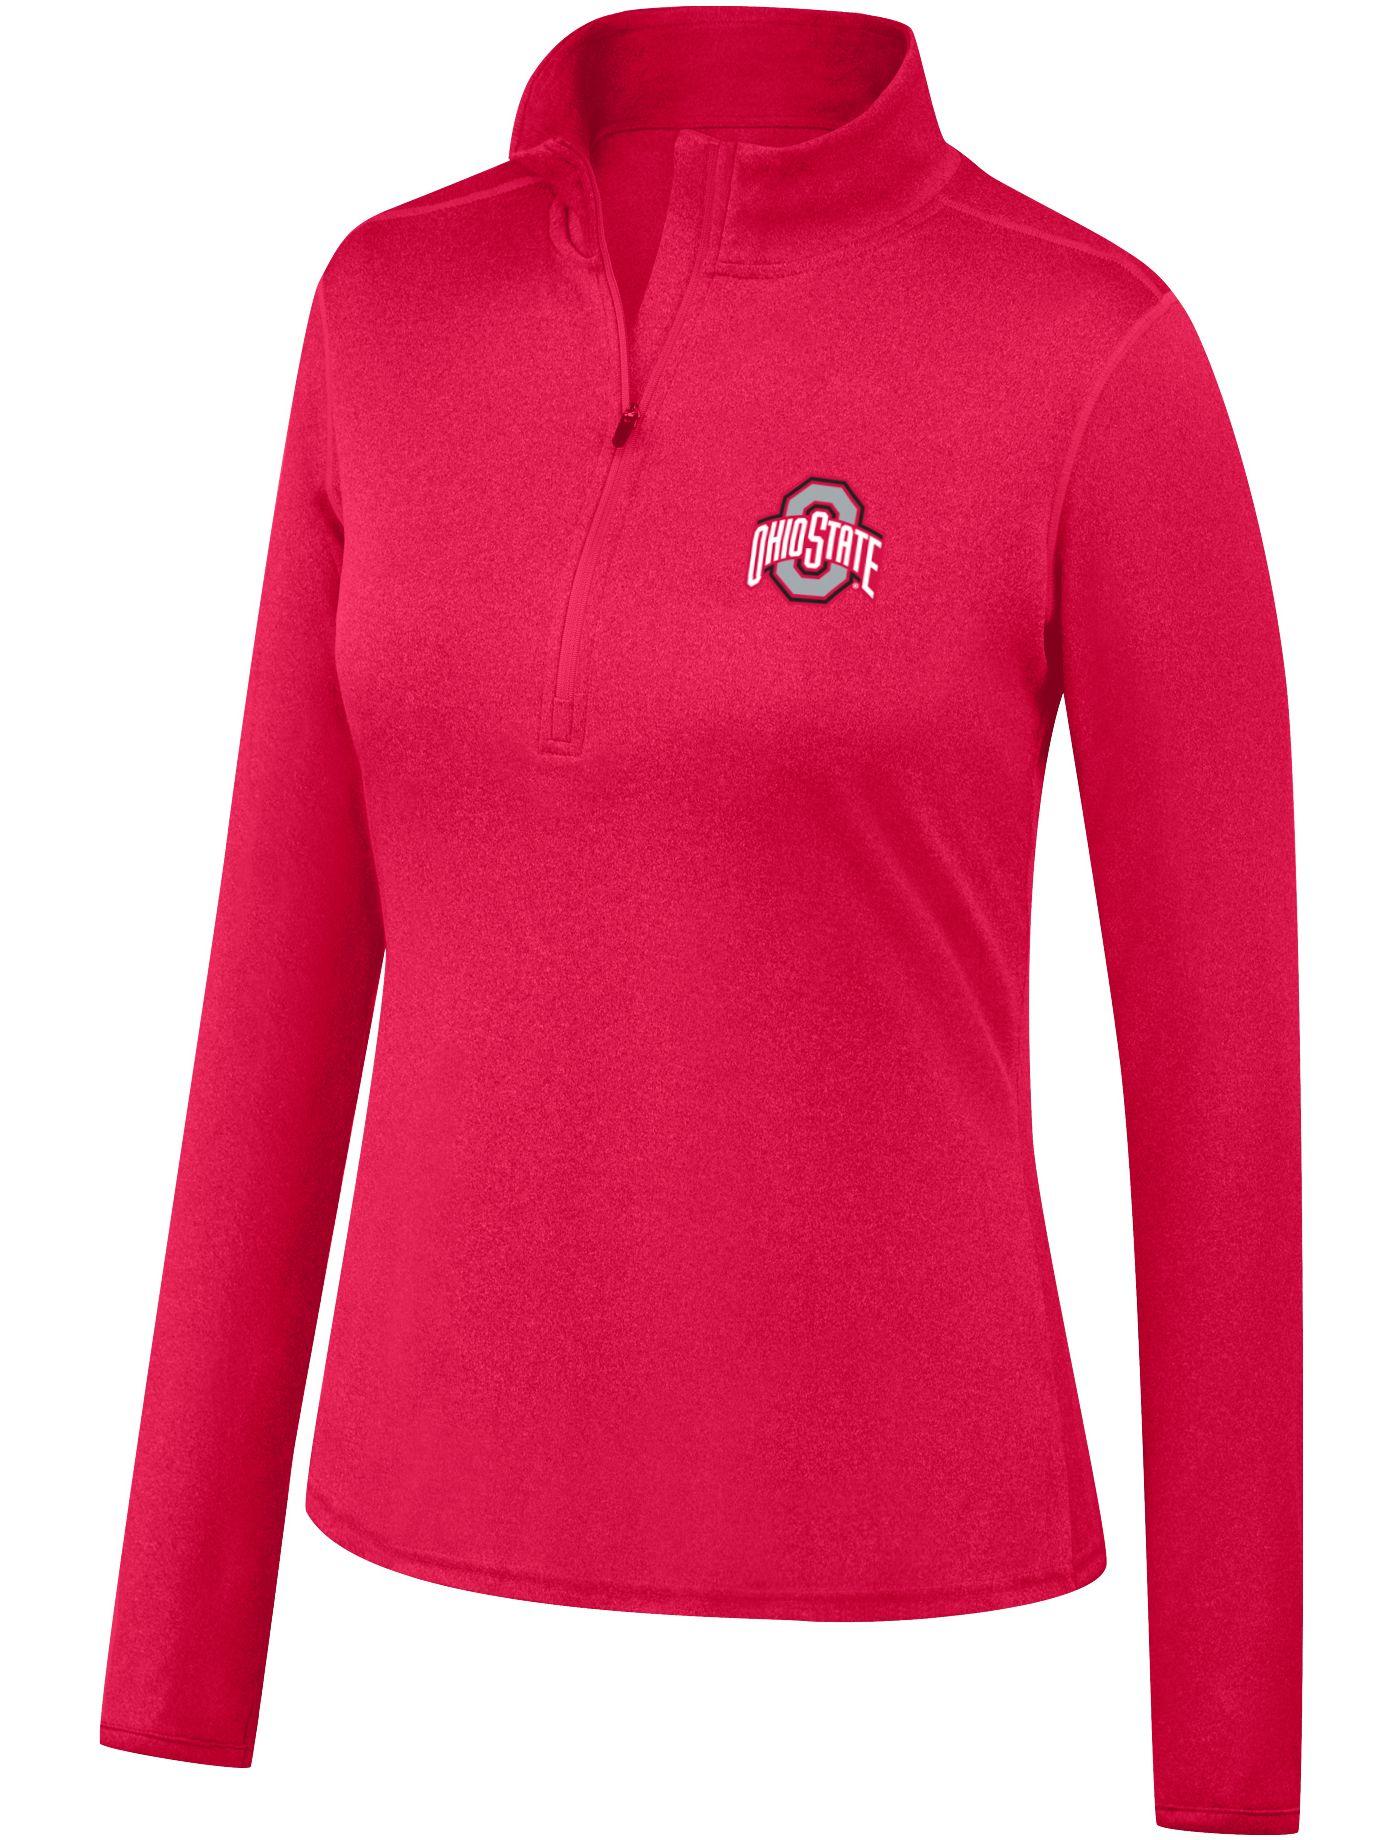 Scarlet & Gray Women's Ohio State Buckeyes Scarlet Quarter-Zip Shirt